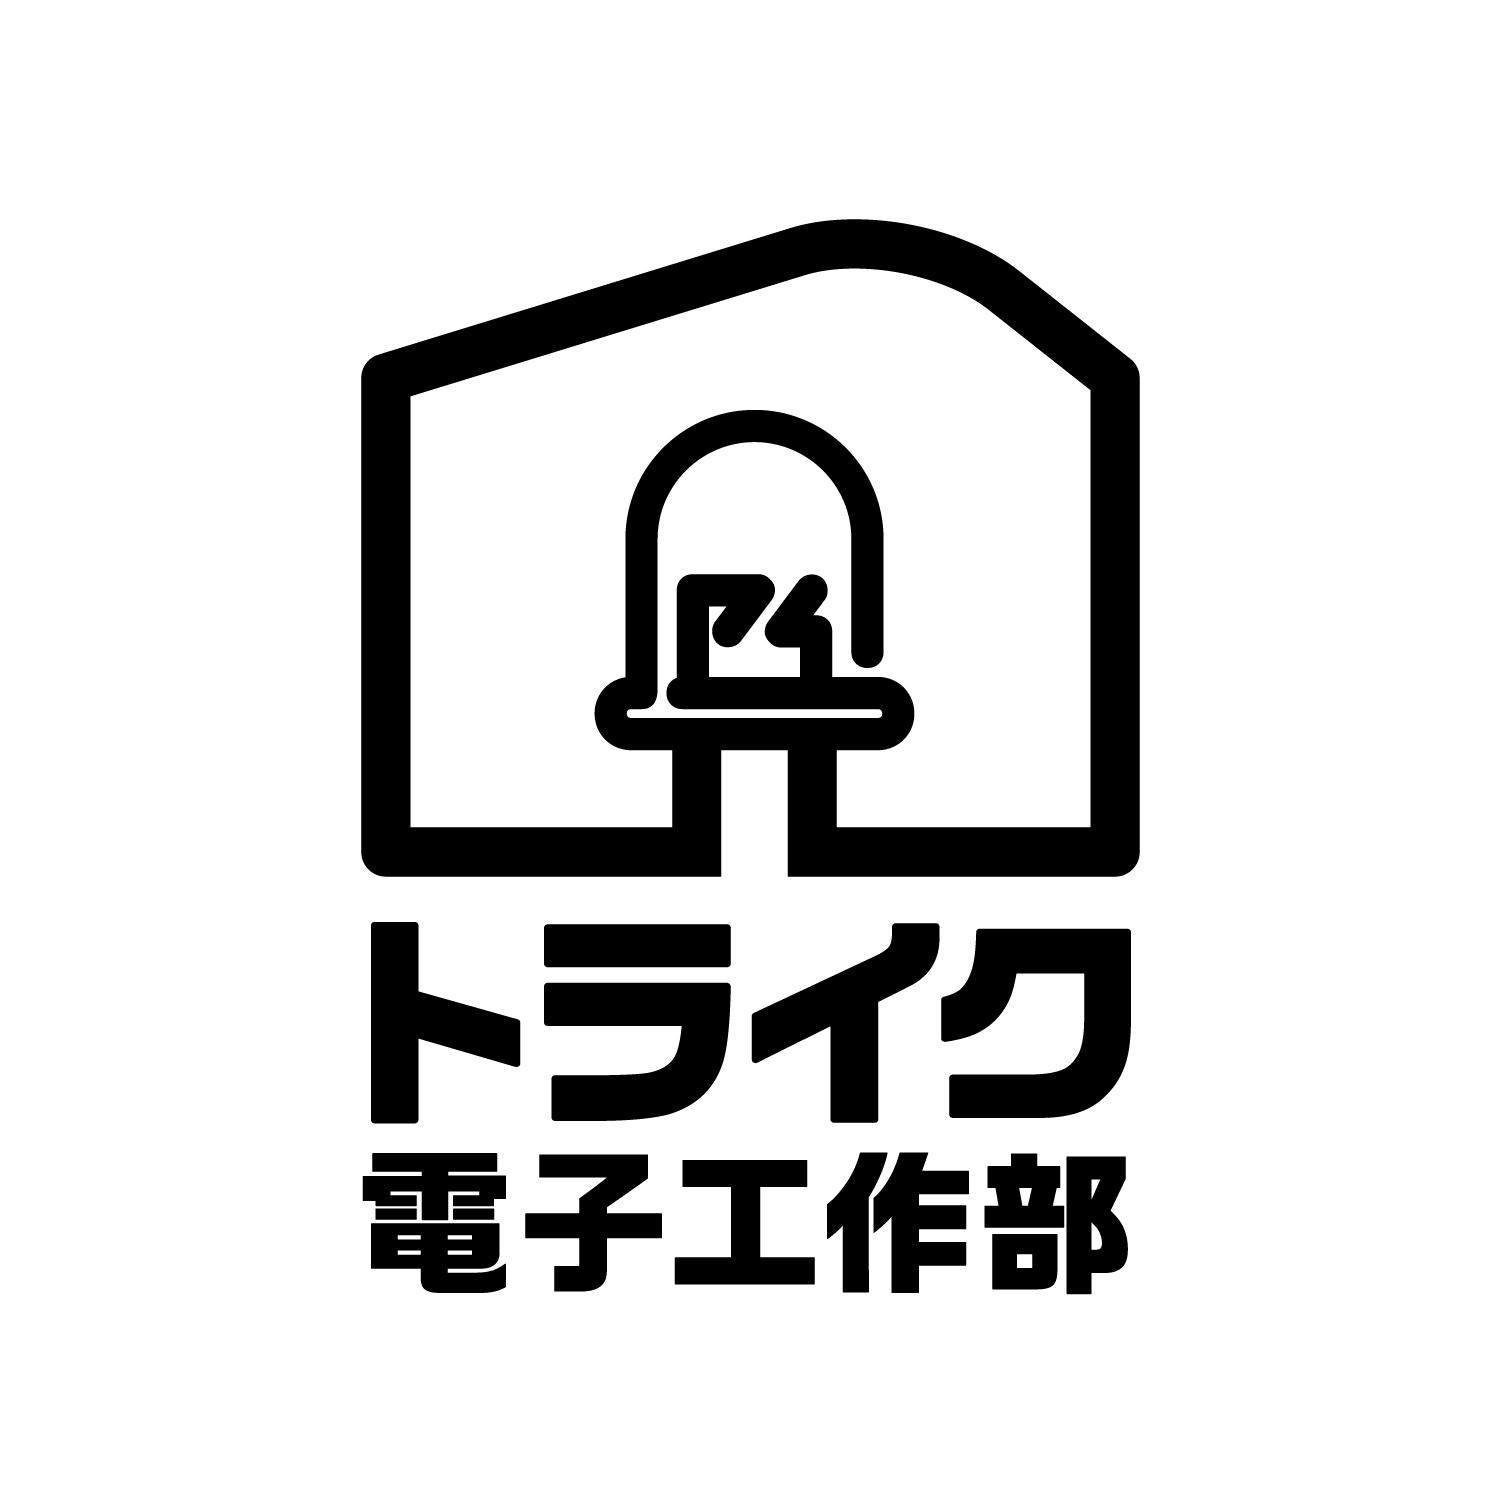 traike_eec_logo2